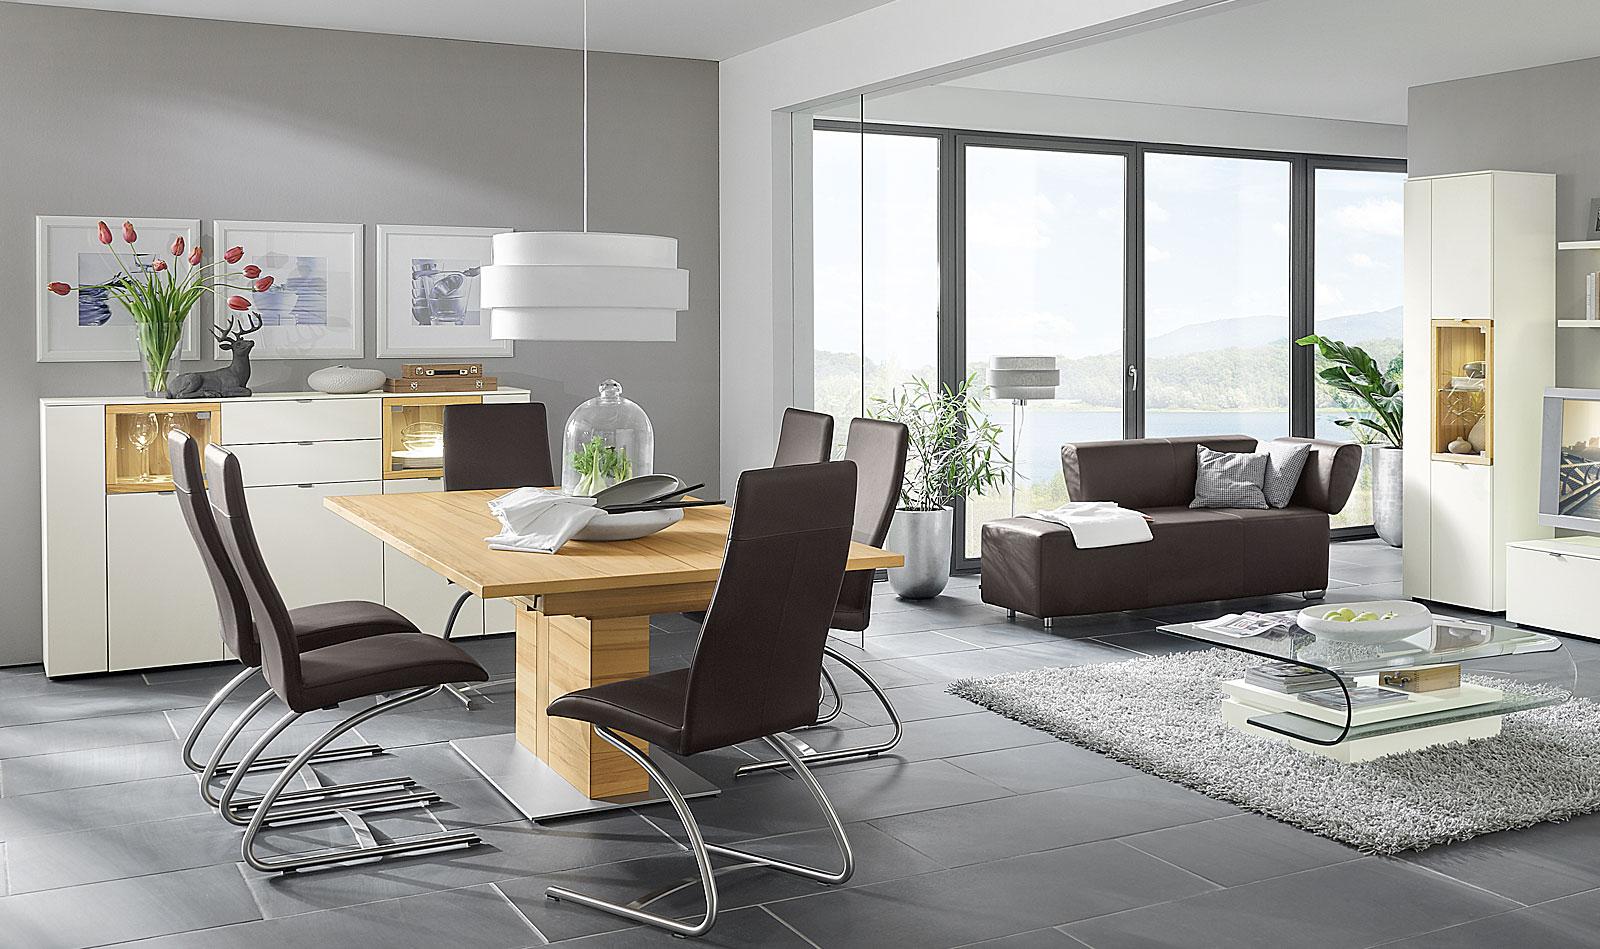 esszimmer programme andiamo venjakob m bel vorsprung durch design und qualit t. Black Bedroom Furniture Sets. Home Design Ideas